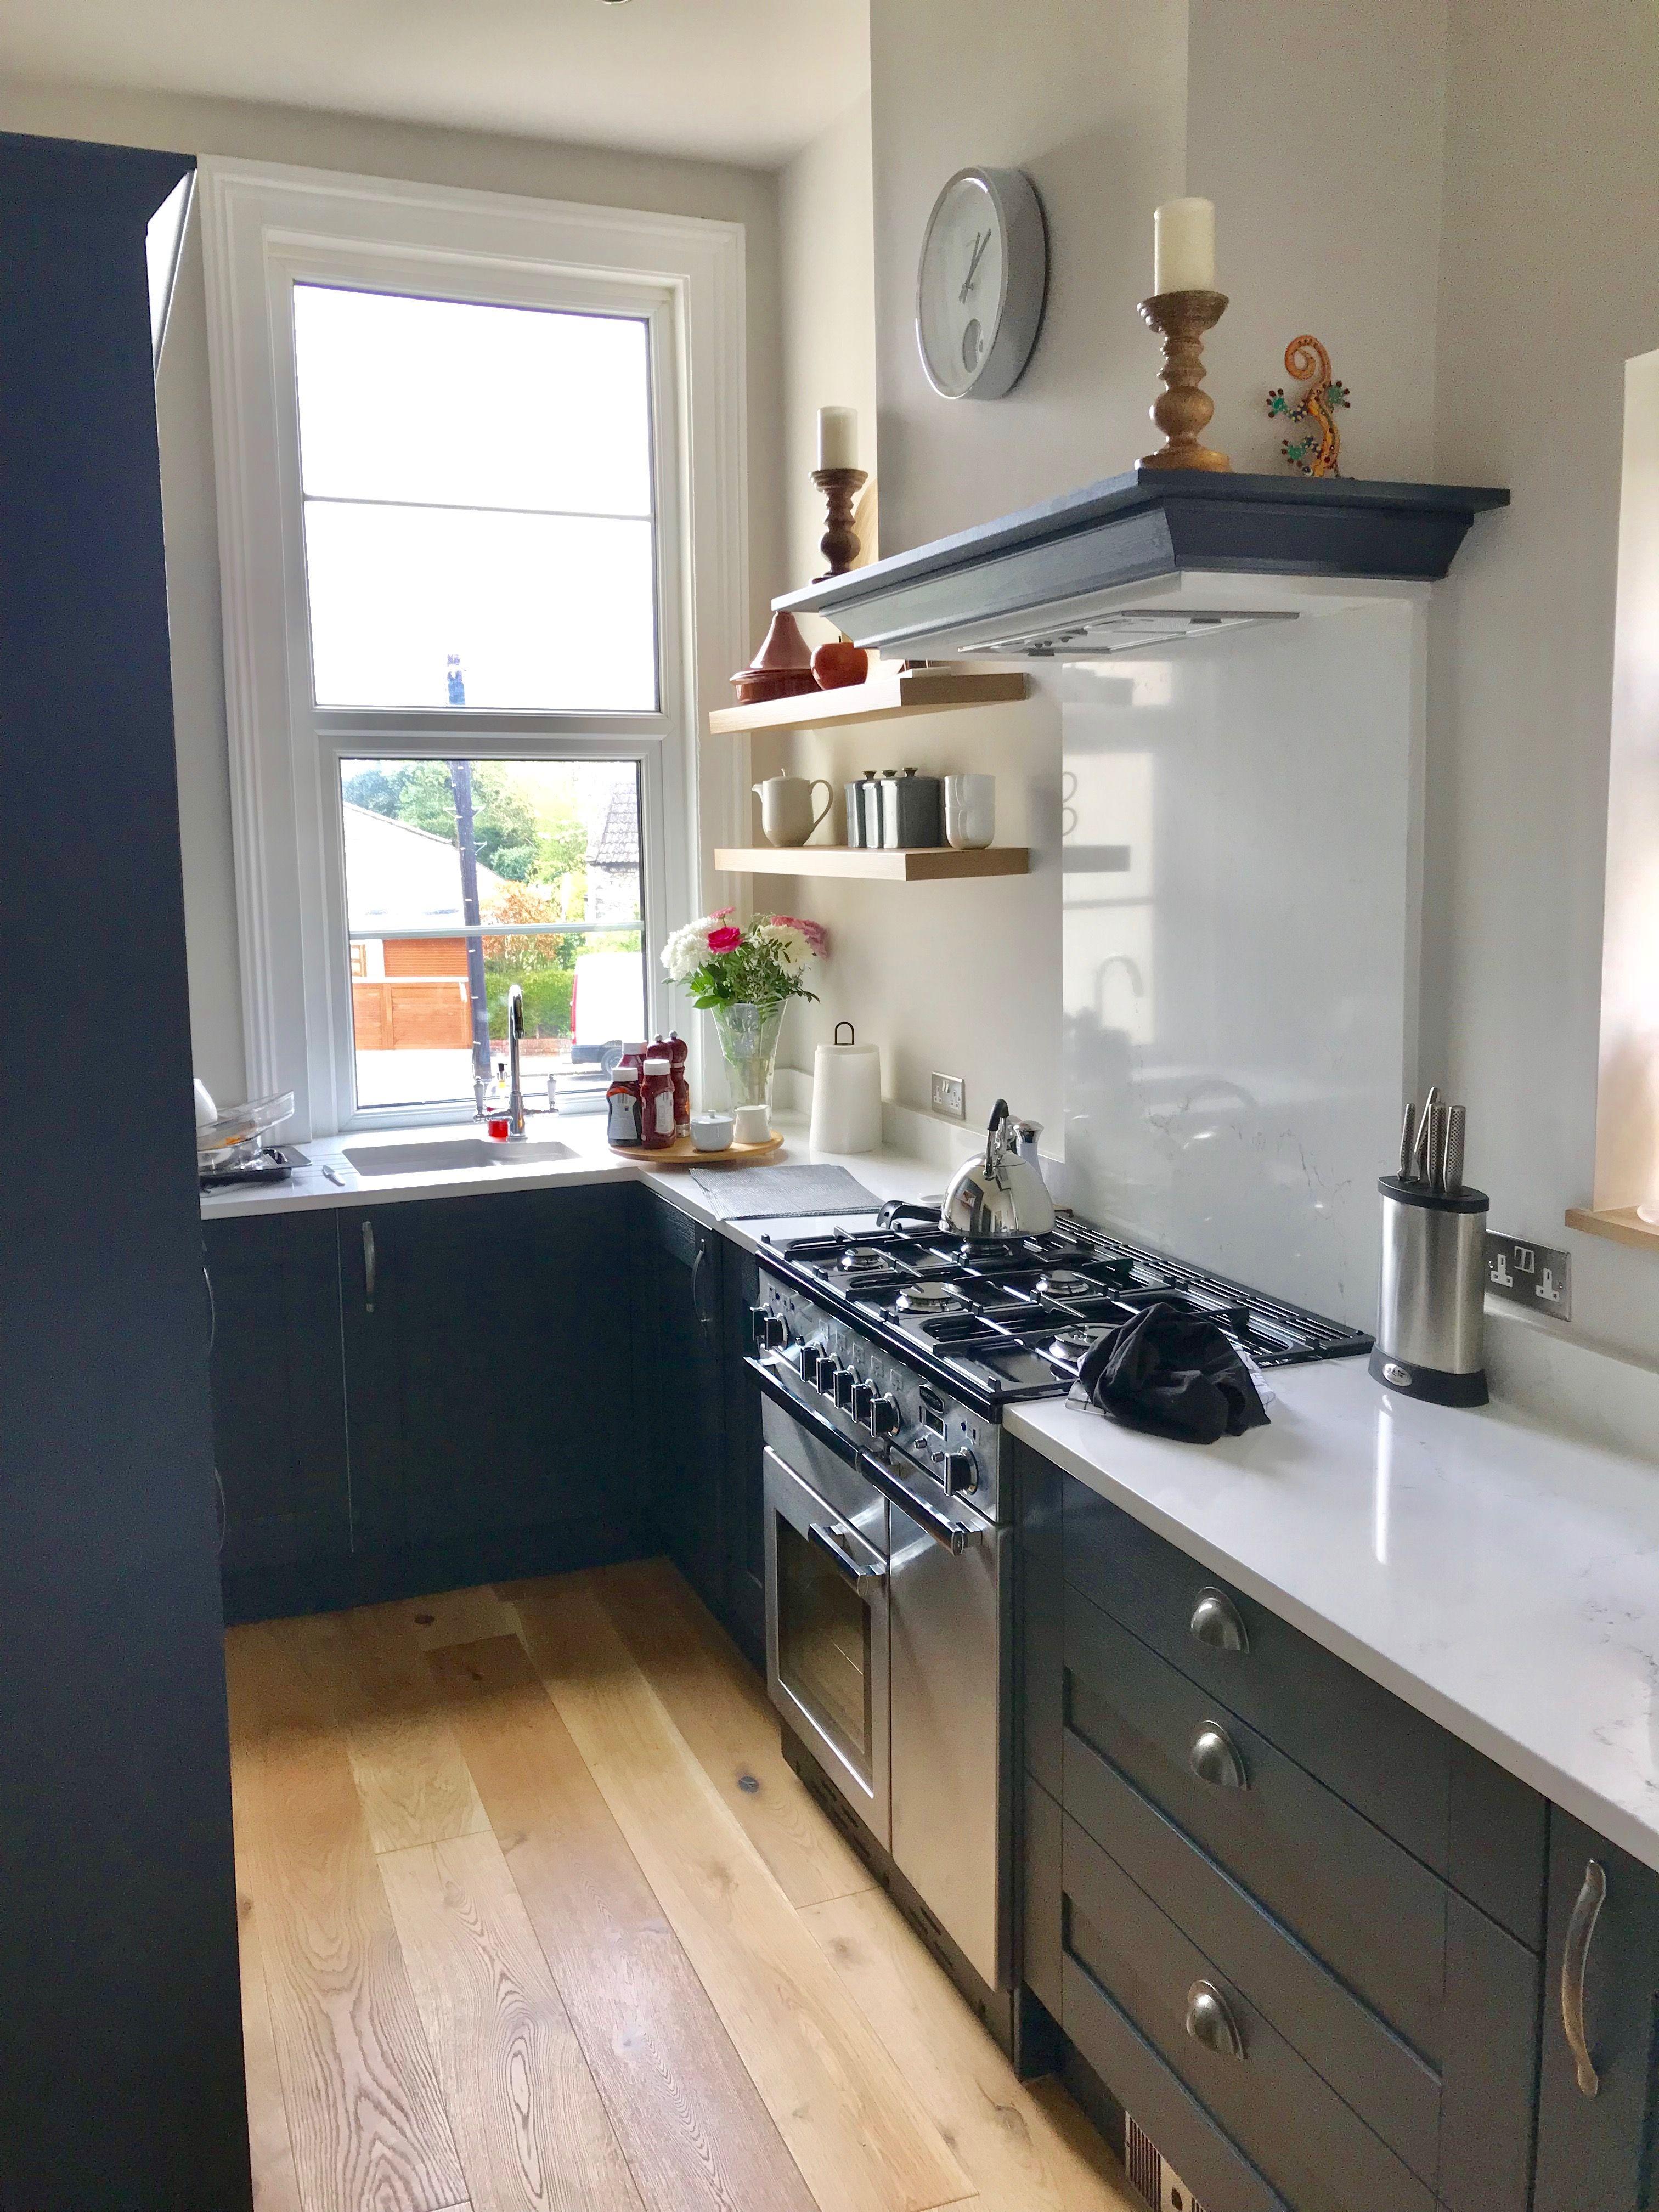 Benchmarx kitchens, Sherwood Charcoal, Benchmarx Stoke